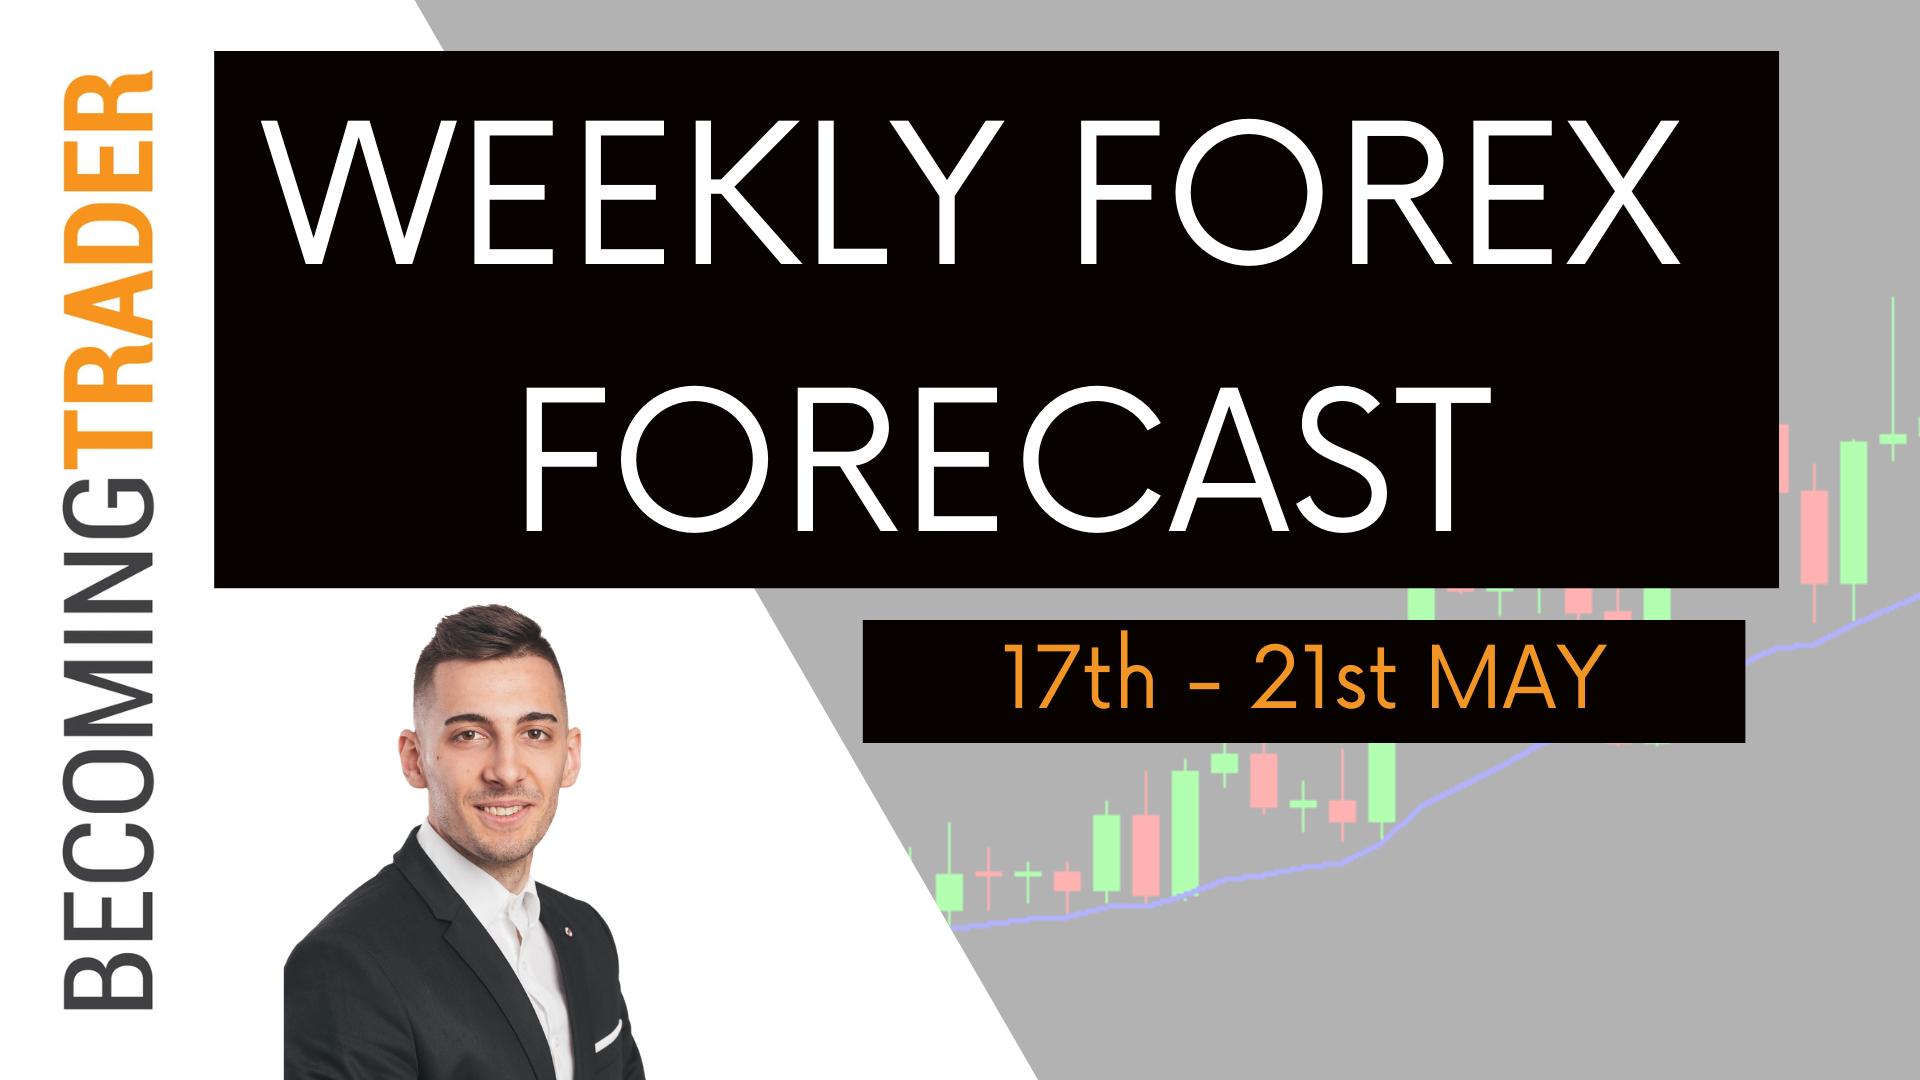 Weekly Forex Forecast 17th to 21st May 2021 | EURUSD , GBPUSD , AUDUSD , NZDUSD , USDCAD , USDJPY